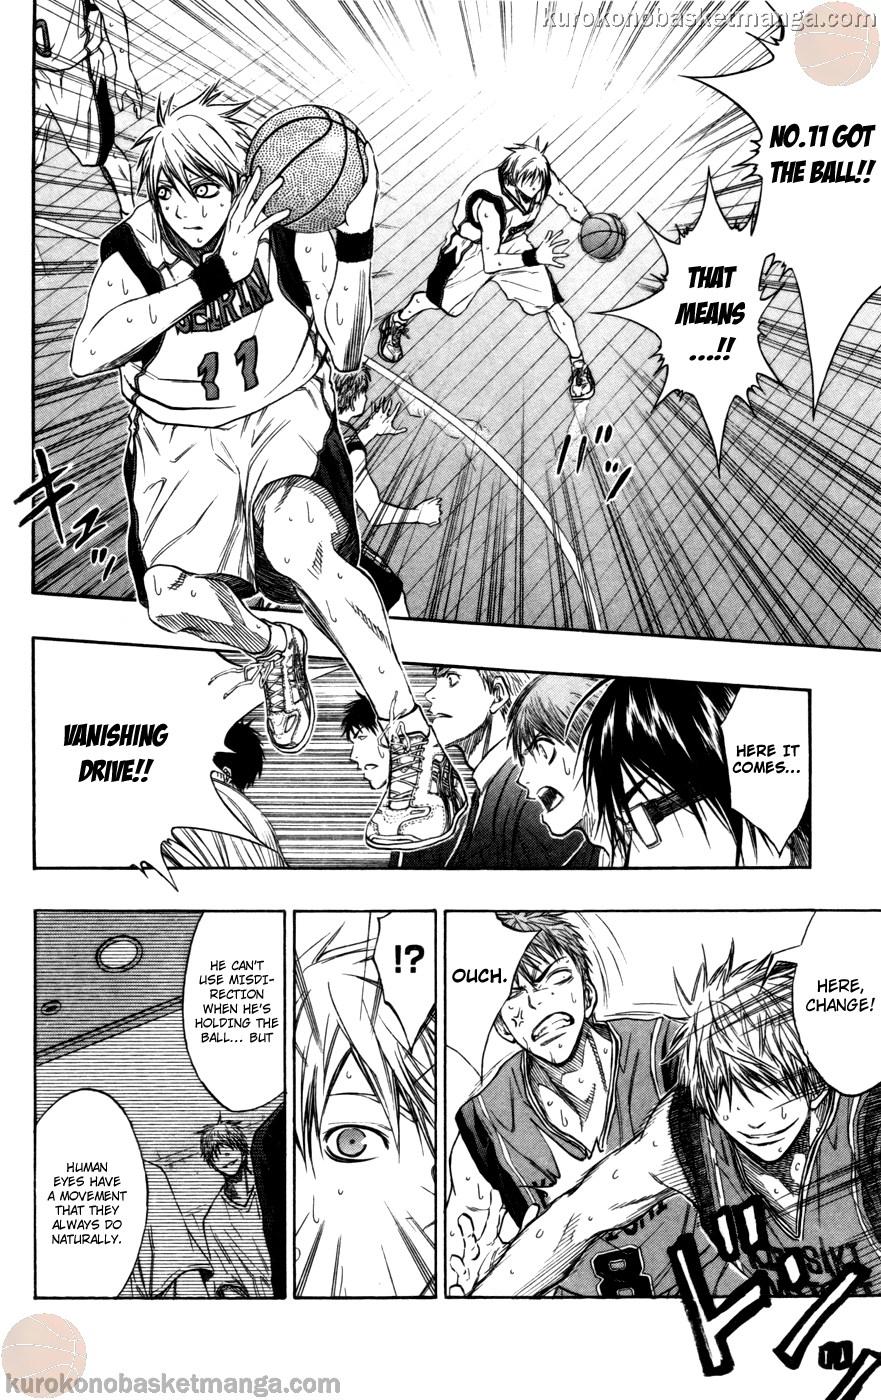 Kuroko no Basket Manga Chapter 103 - Image 14